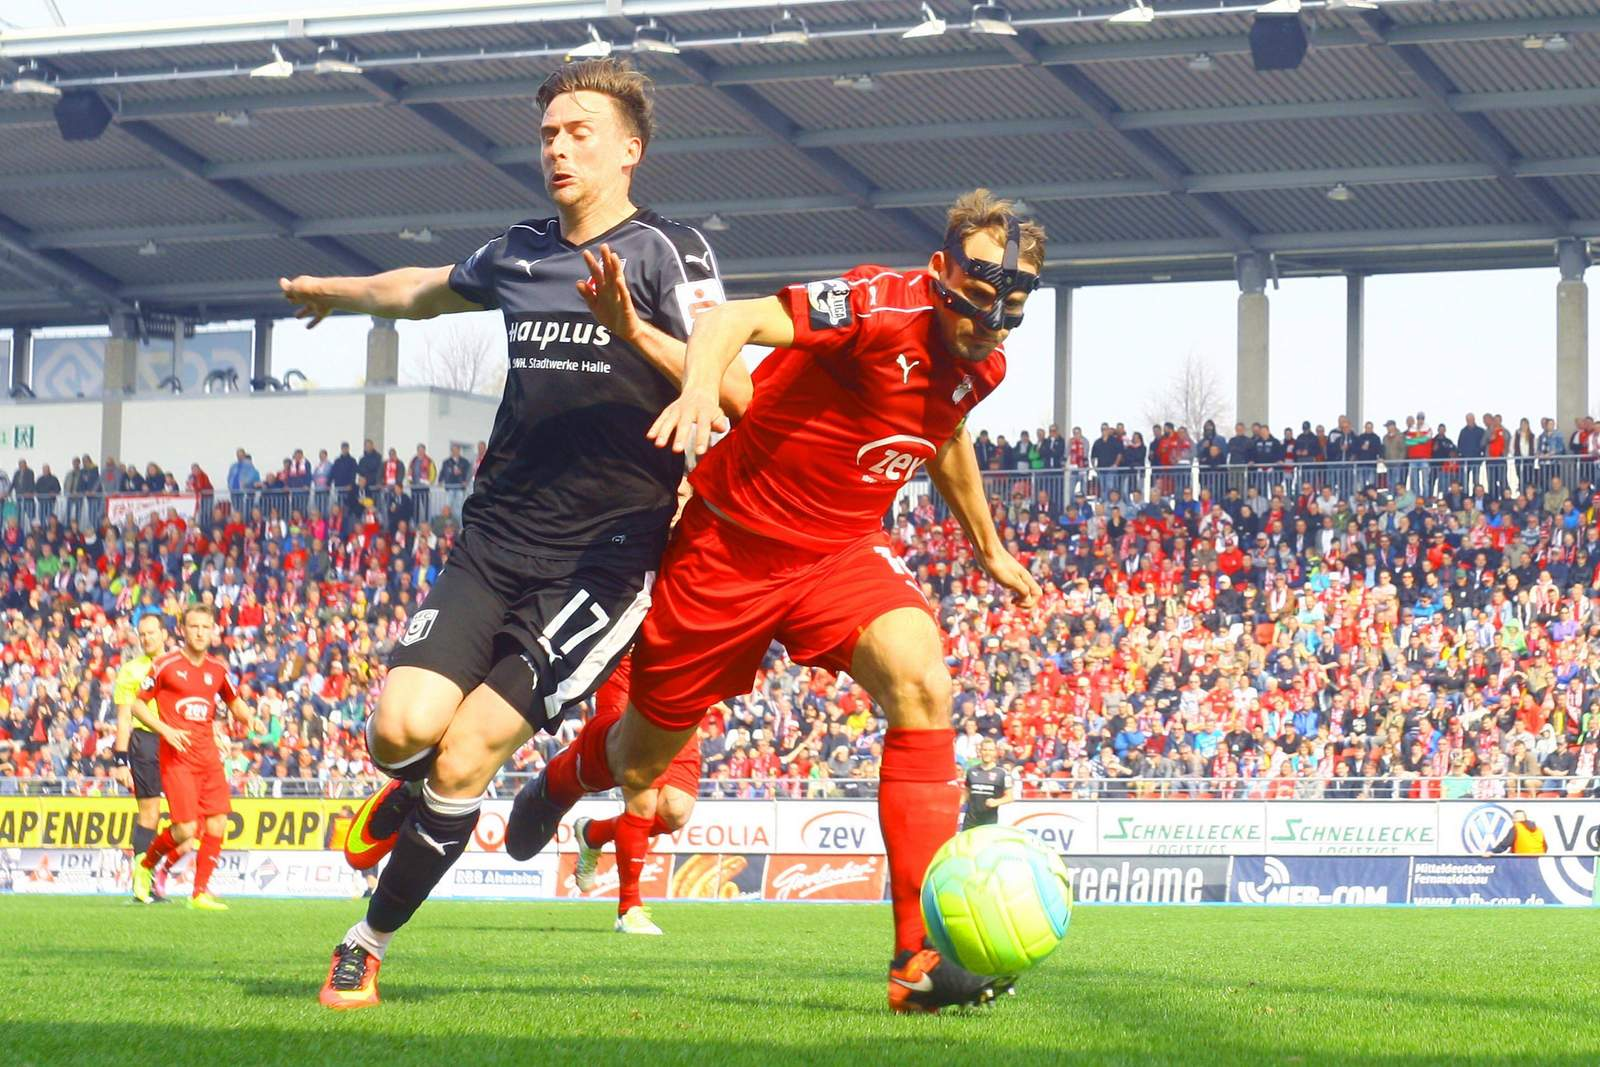 Hasil gambar untuk FSV Zwickau vs VfB Stuttgart